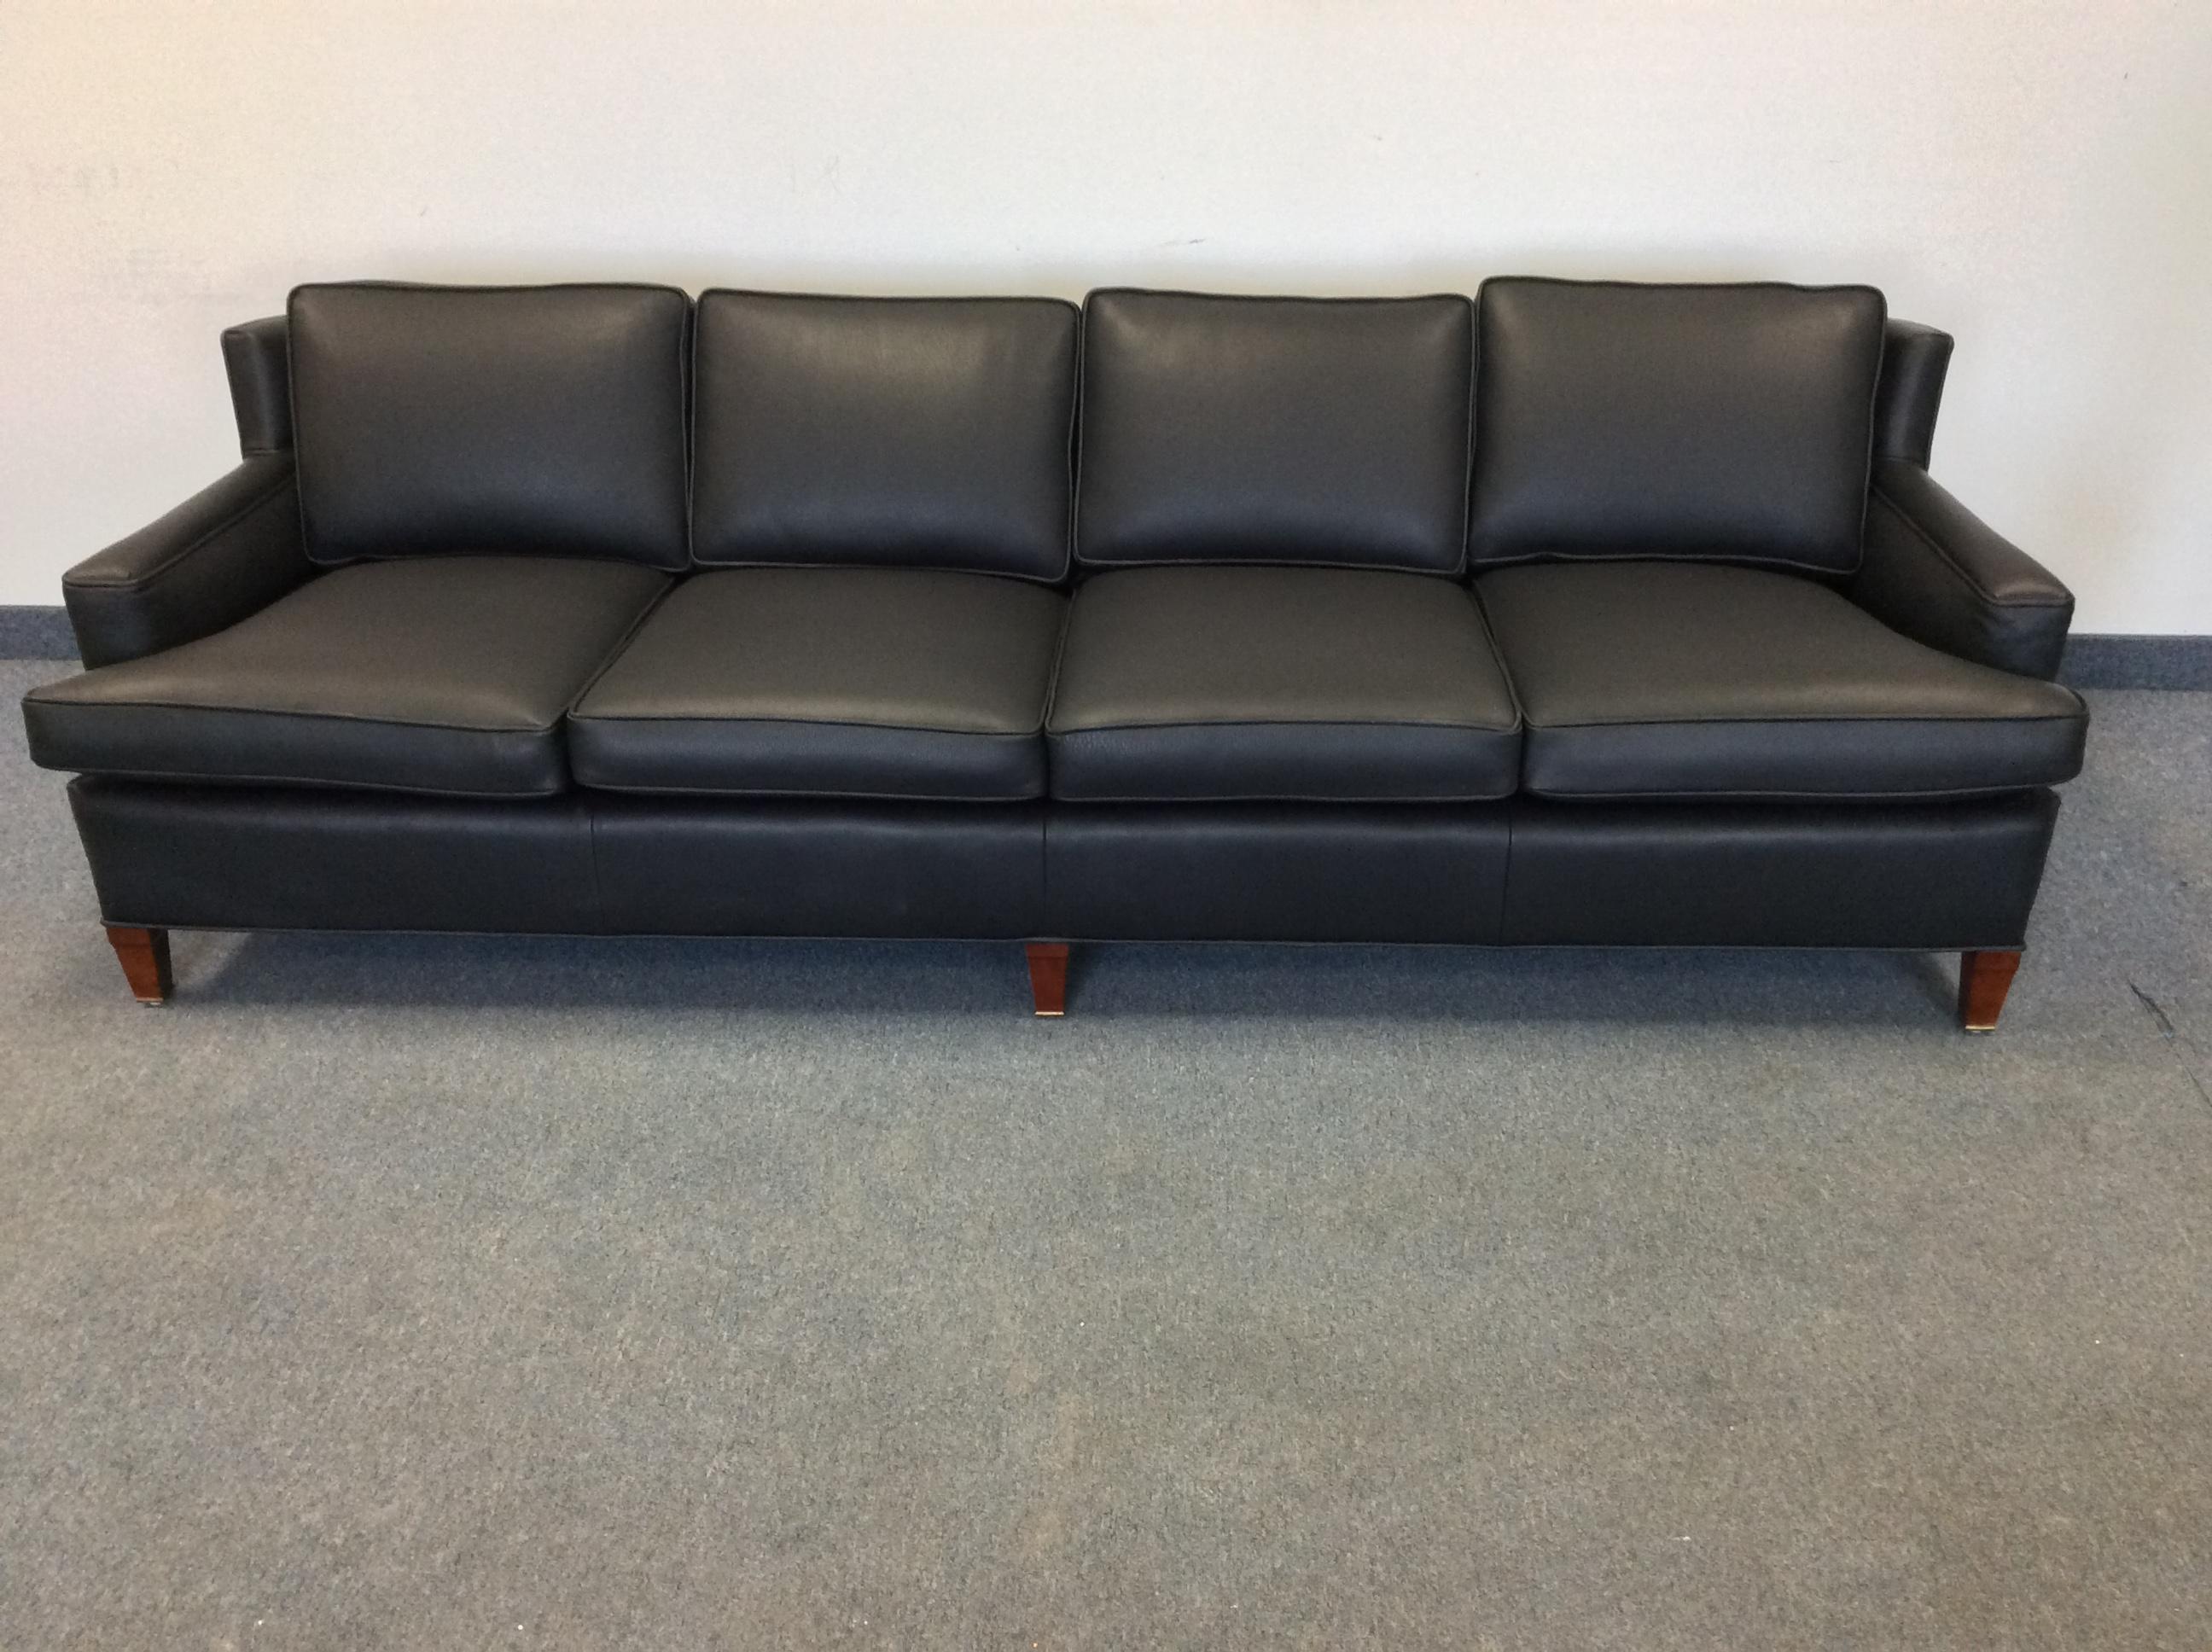 Reupholster Antique Sofa Fabric Sofas